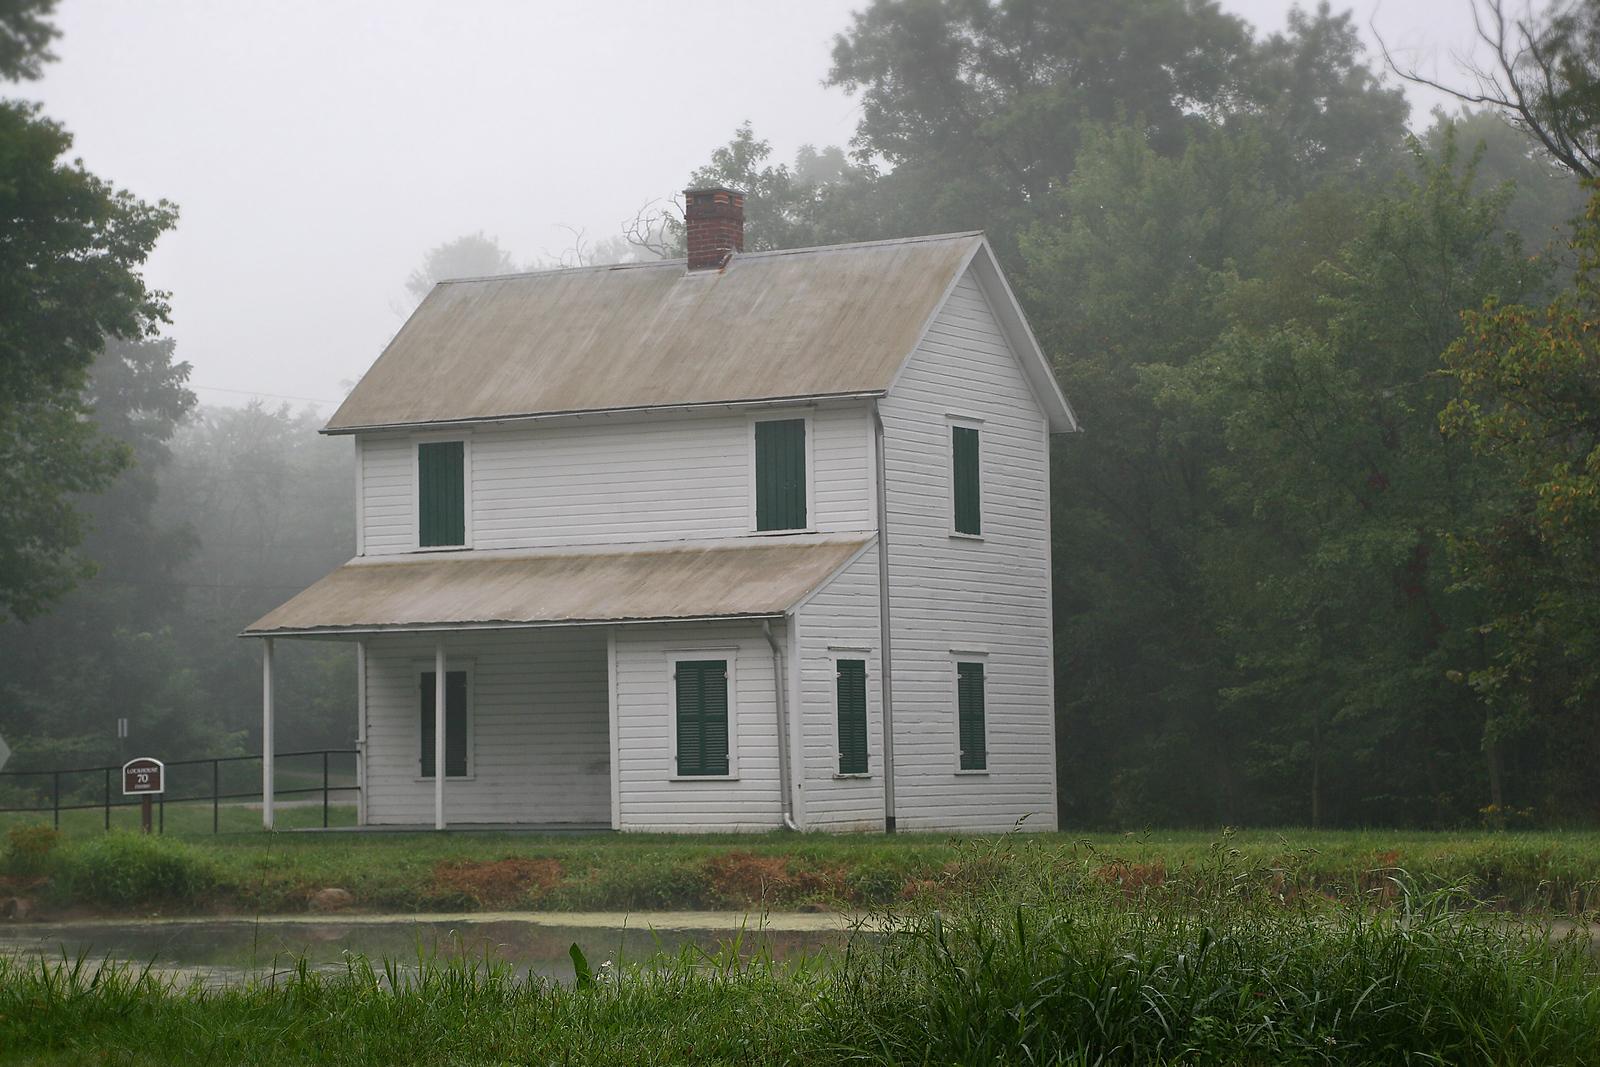 Lock House #70 in Oldtown Maryland.